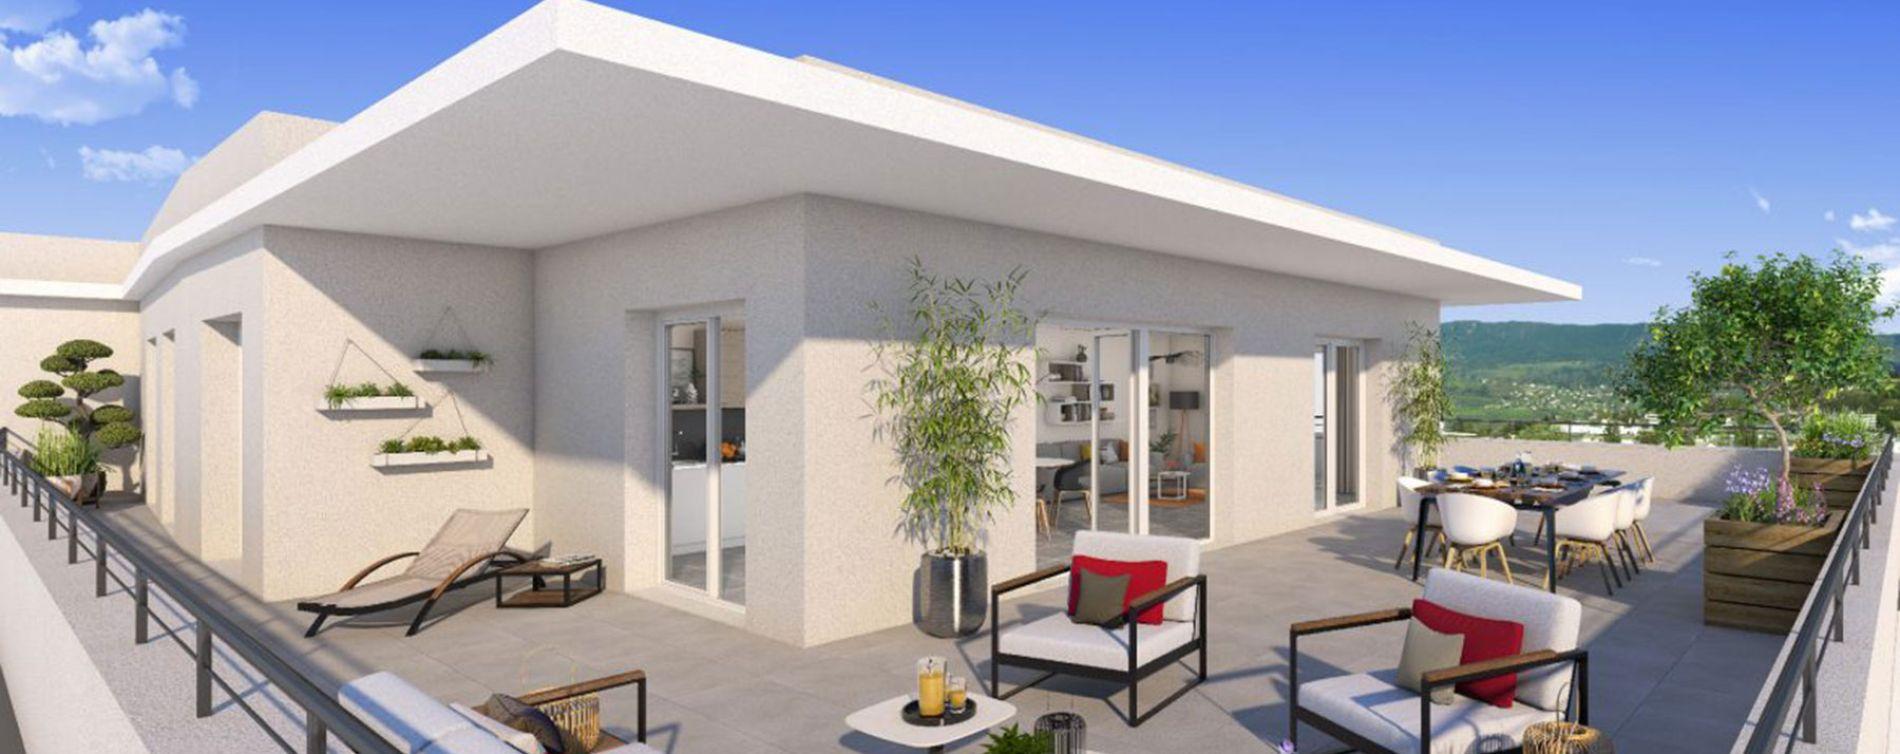 Annemasse : programme immobilier neuve « Shiro » (3)